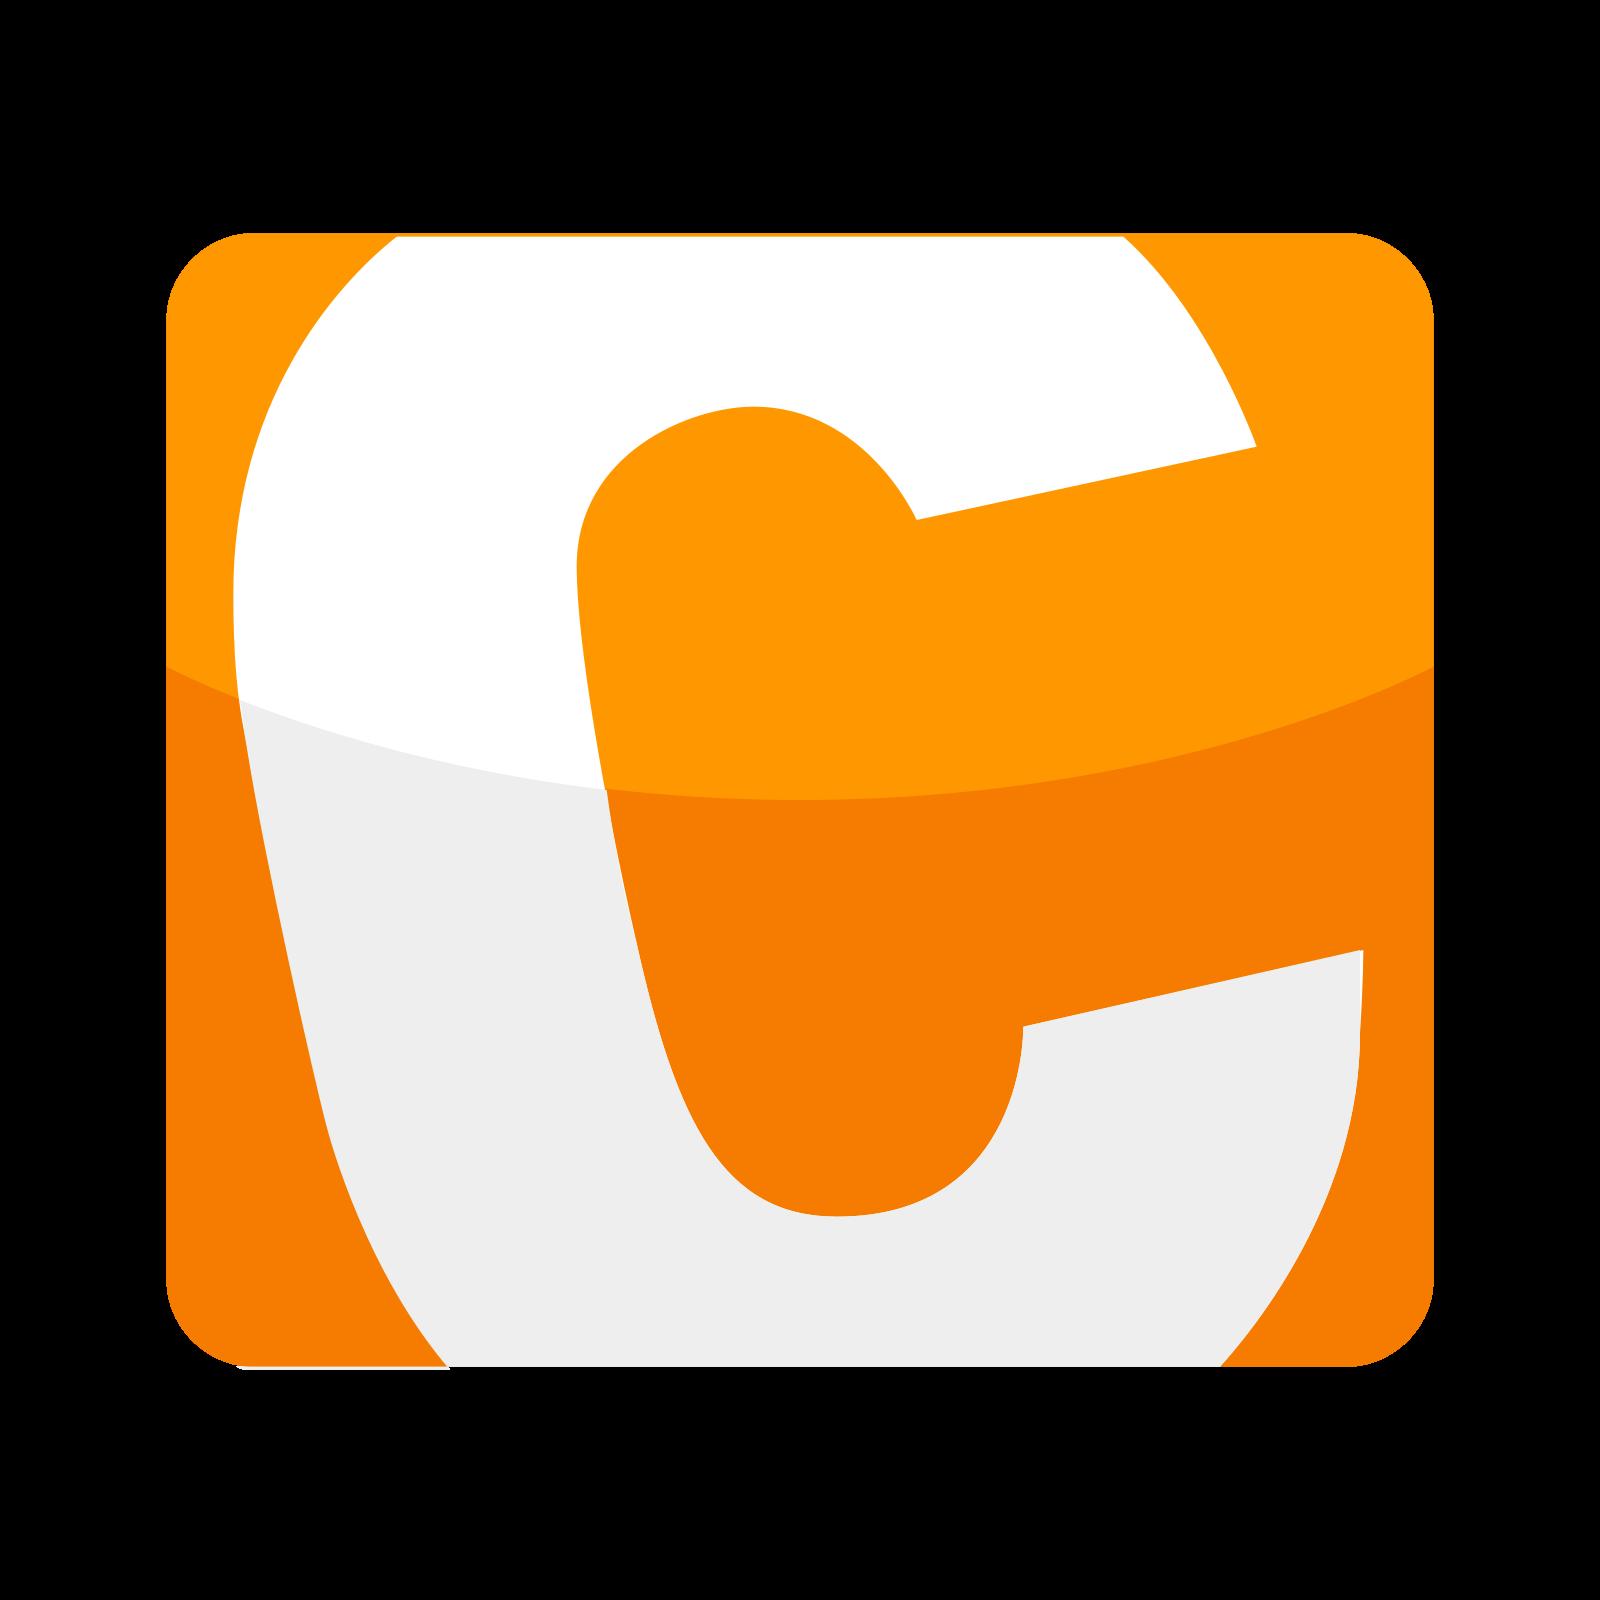 Contao icon